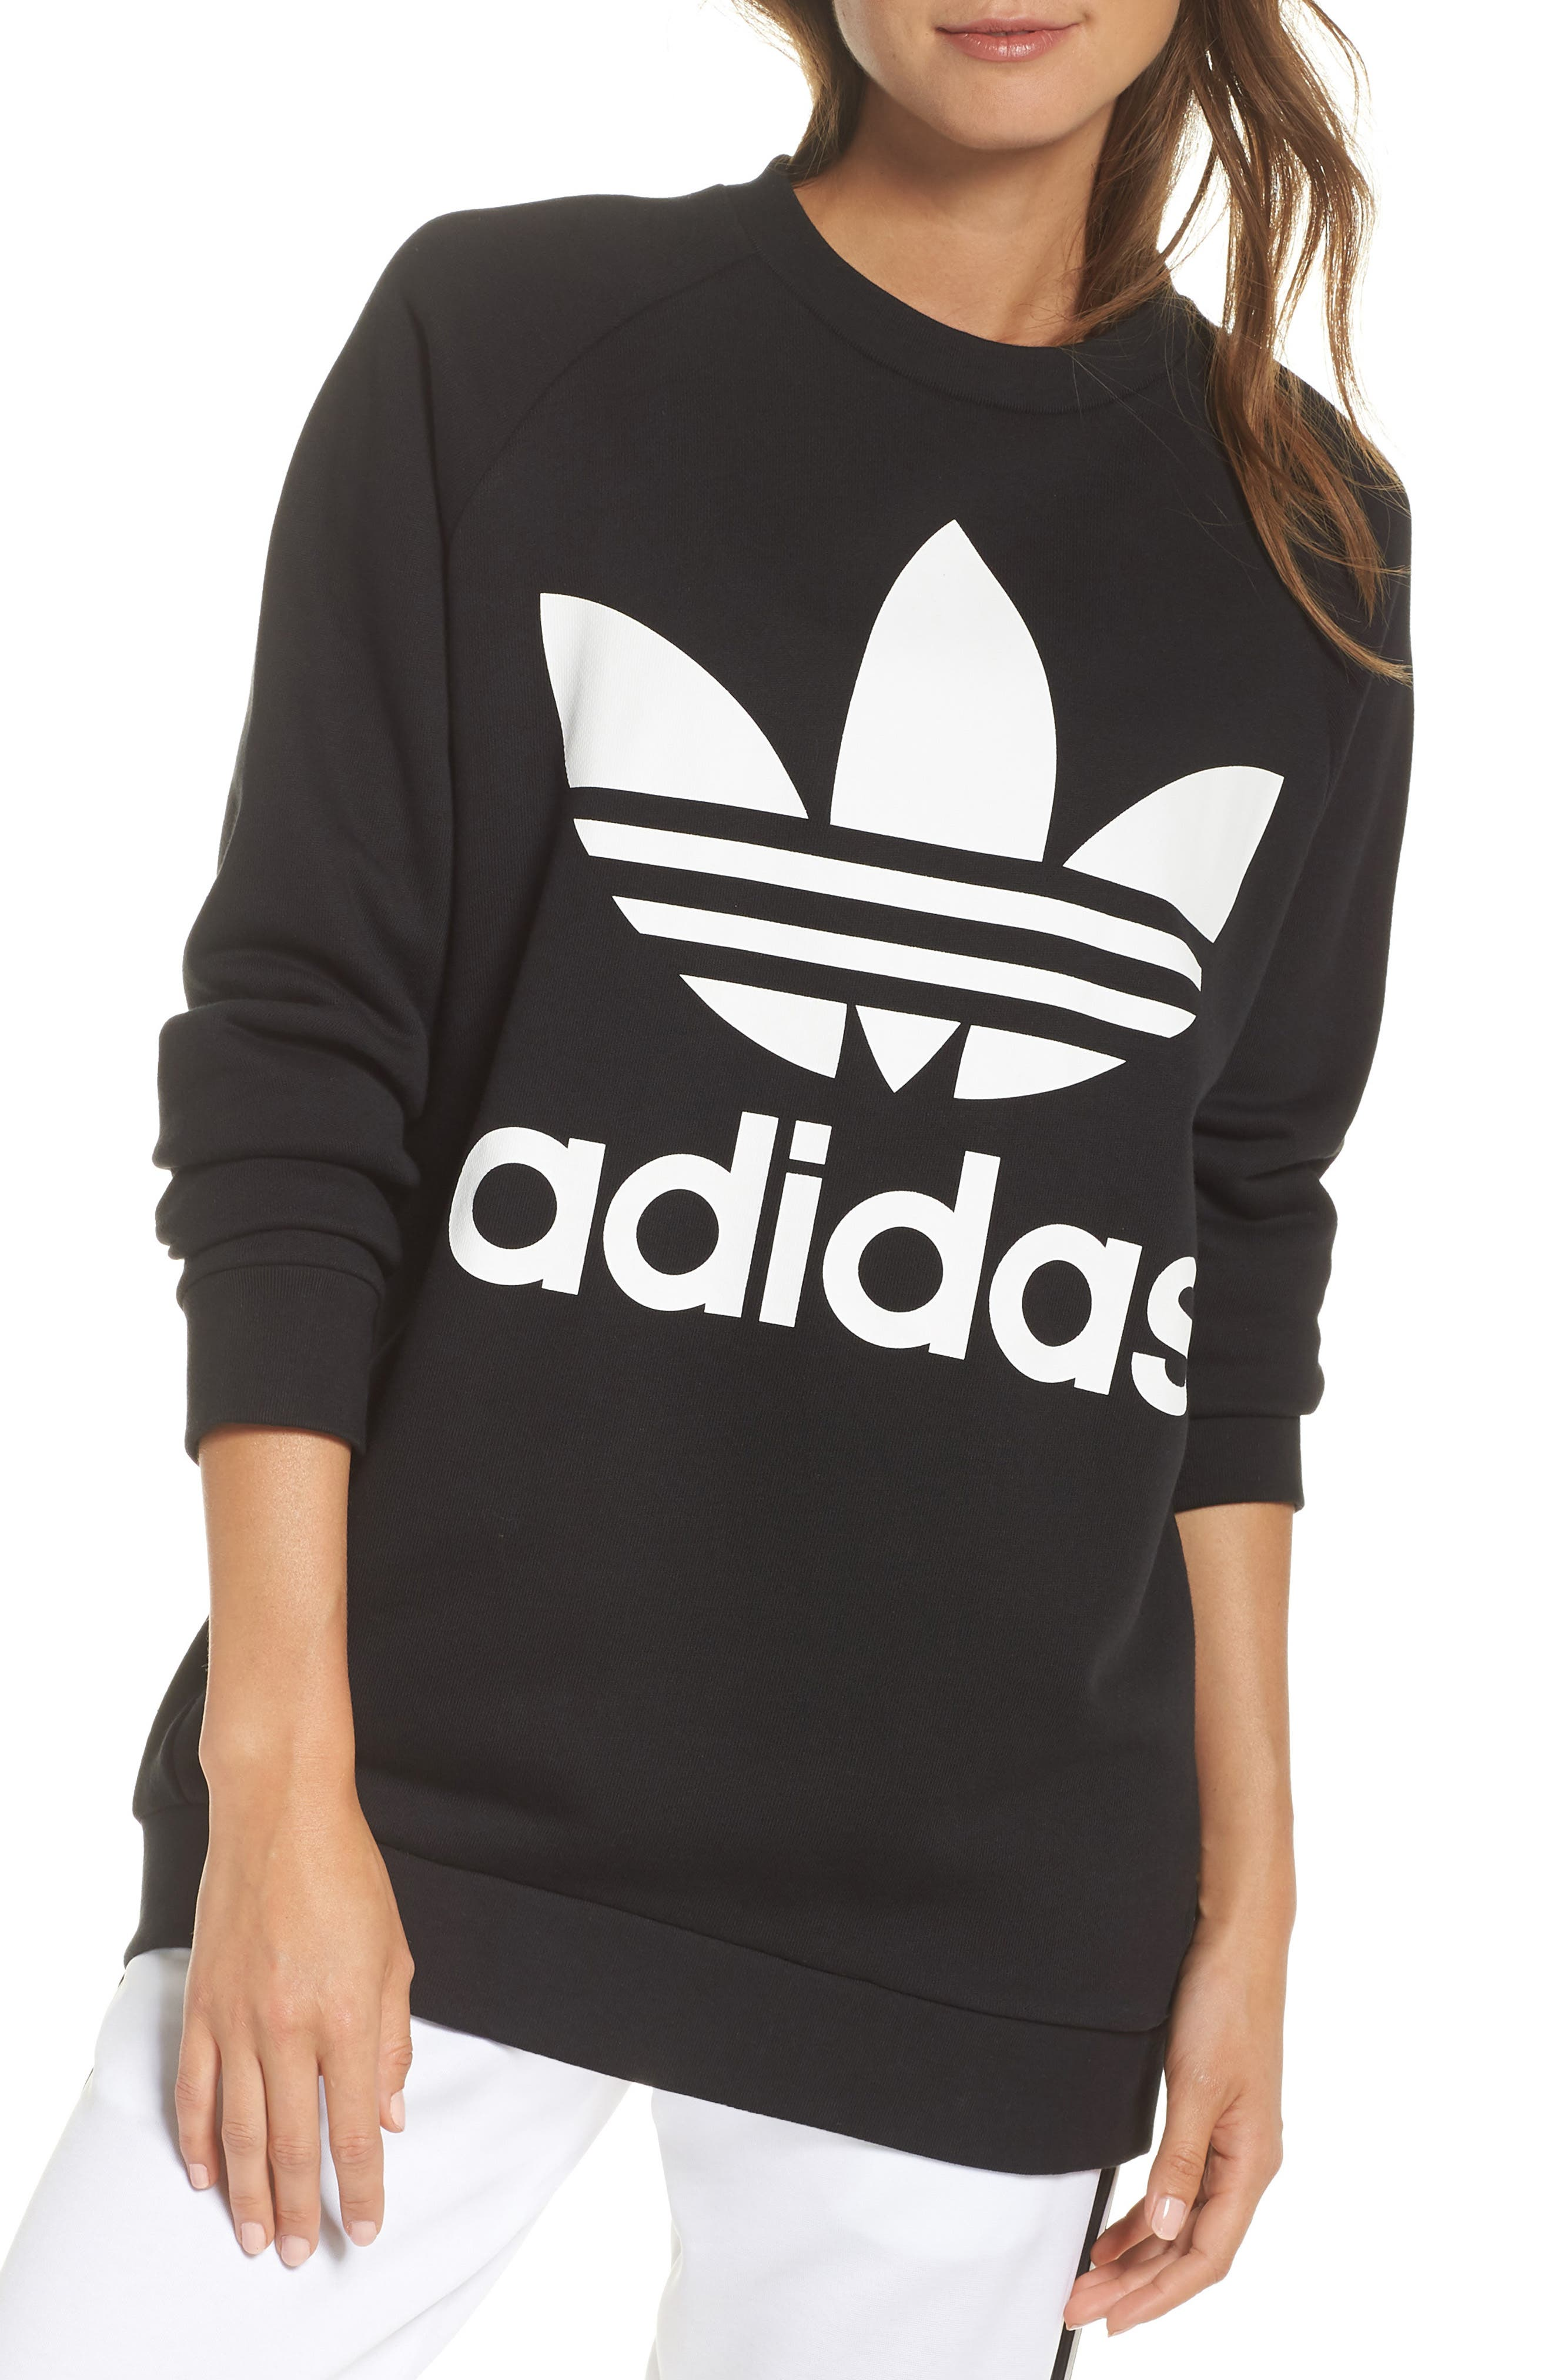 Adidas Originals Oversize Sweatshirt